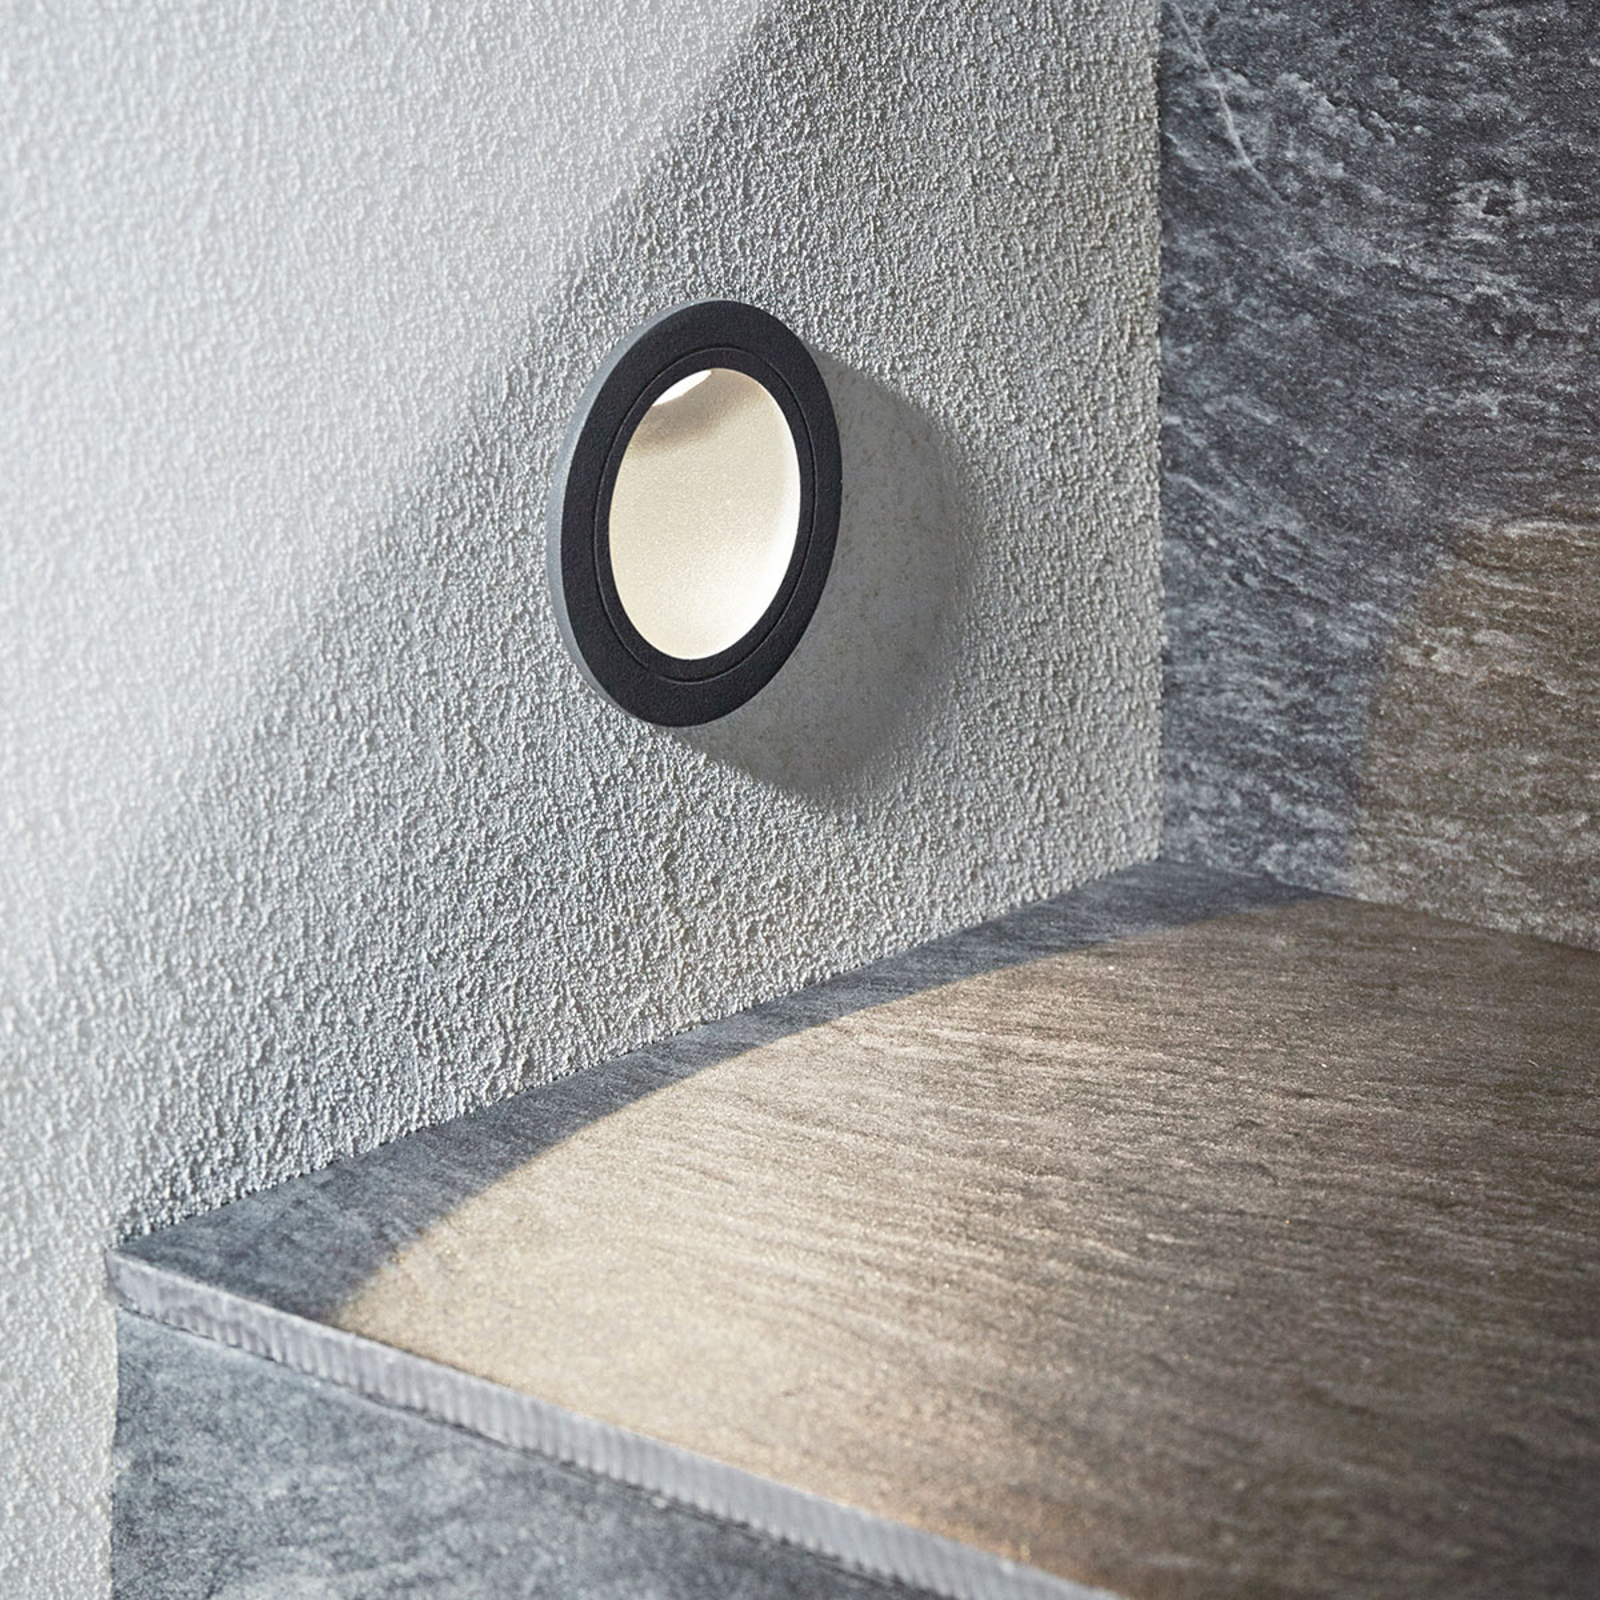 Pordis LED recessed wall light, IP65, round_9969136_1